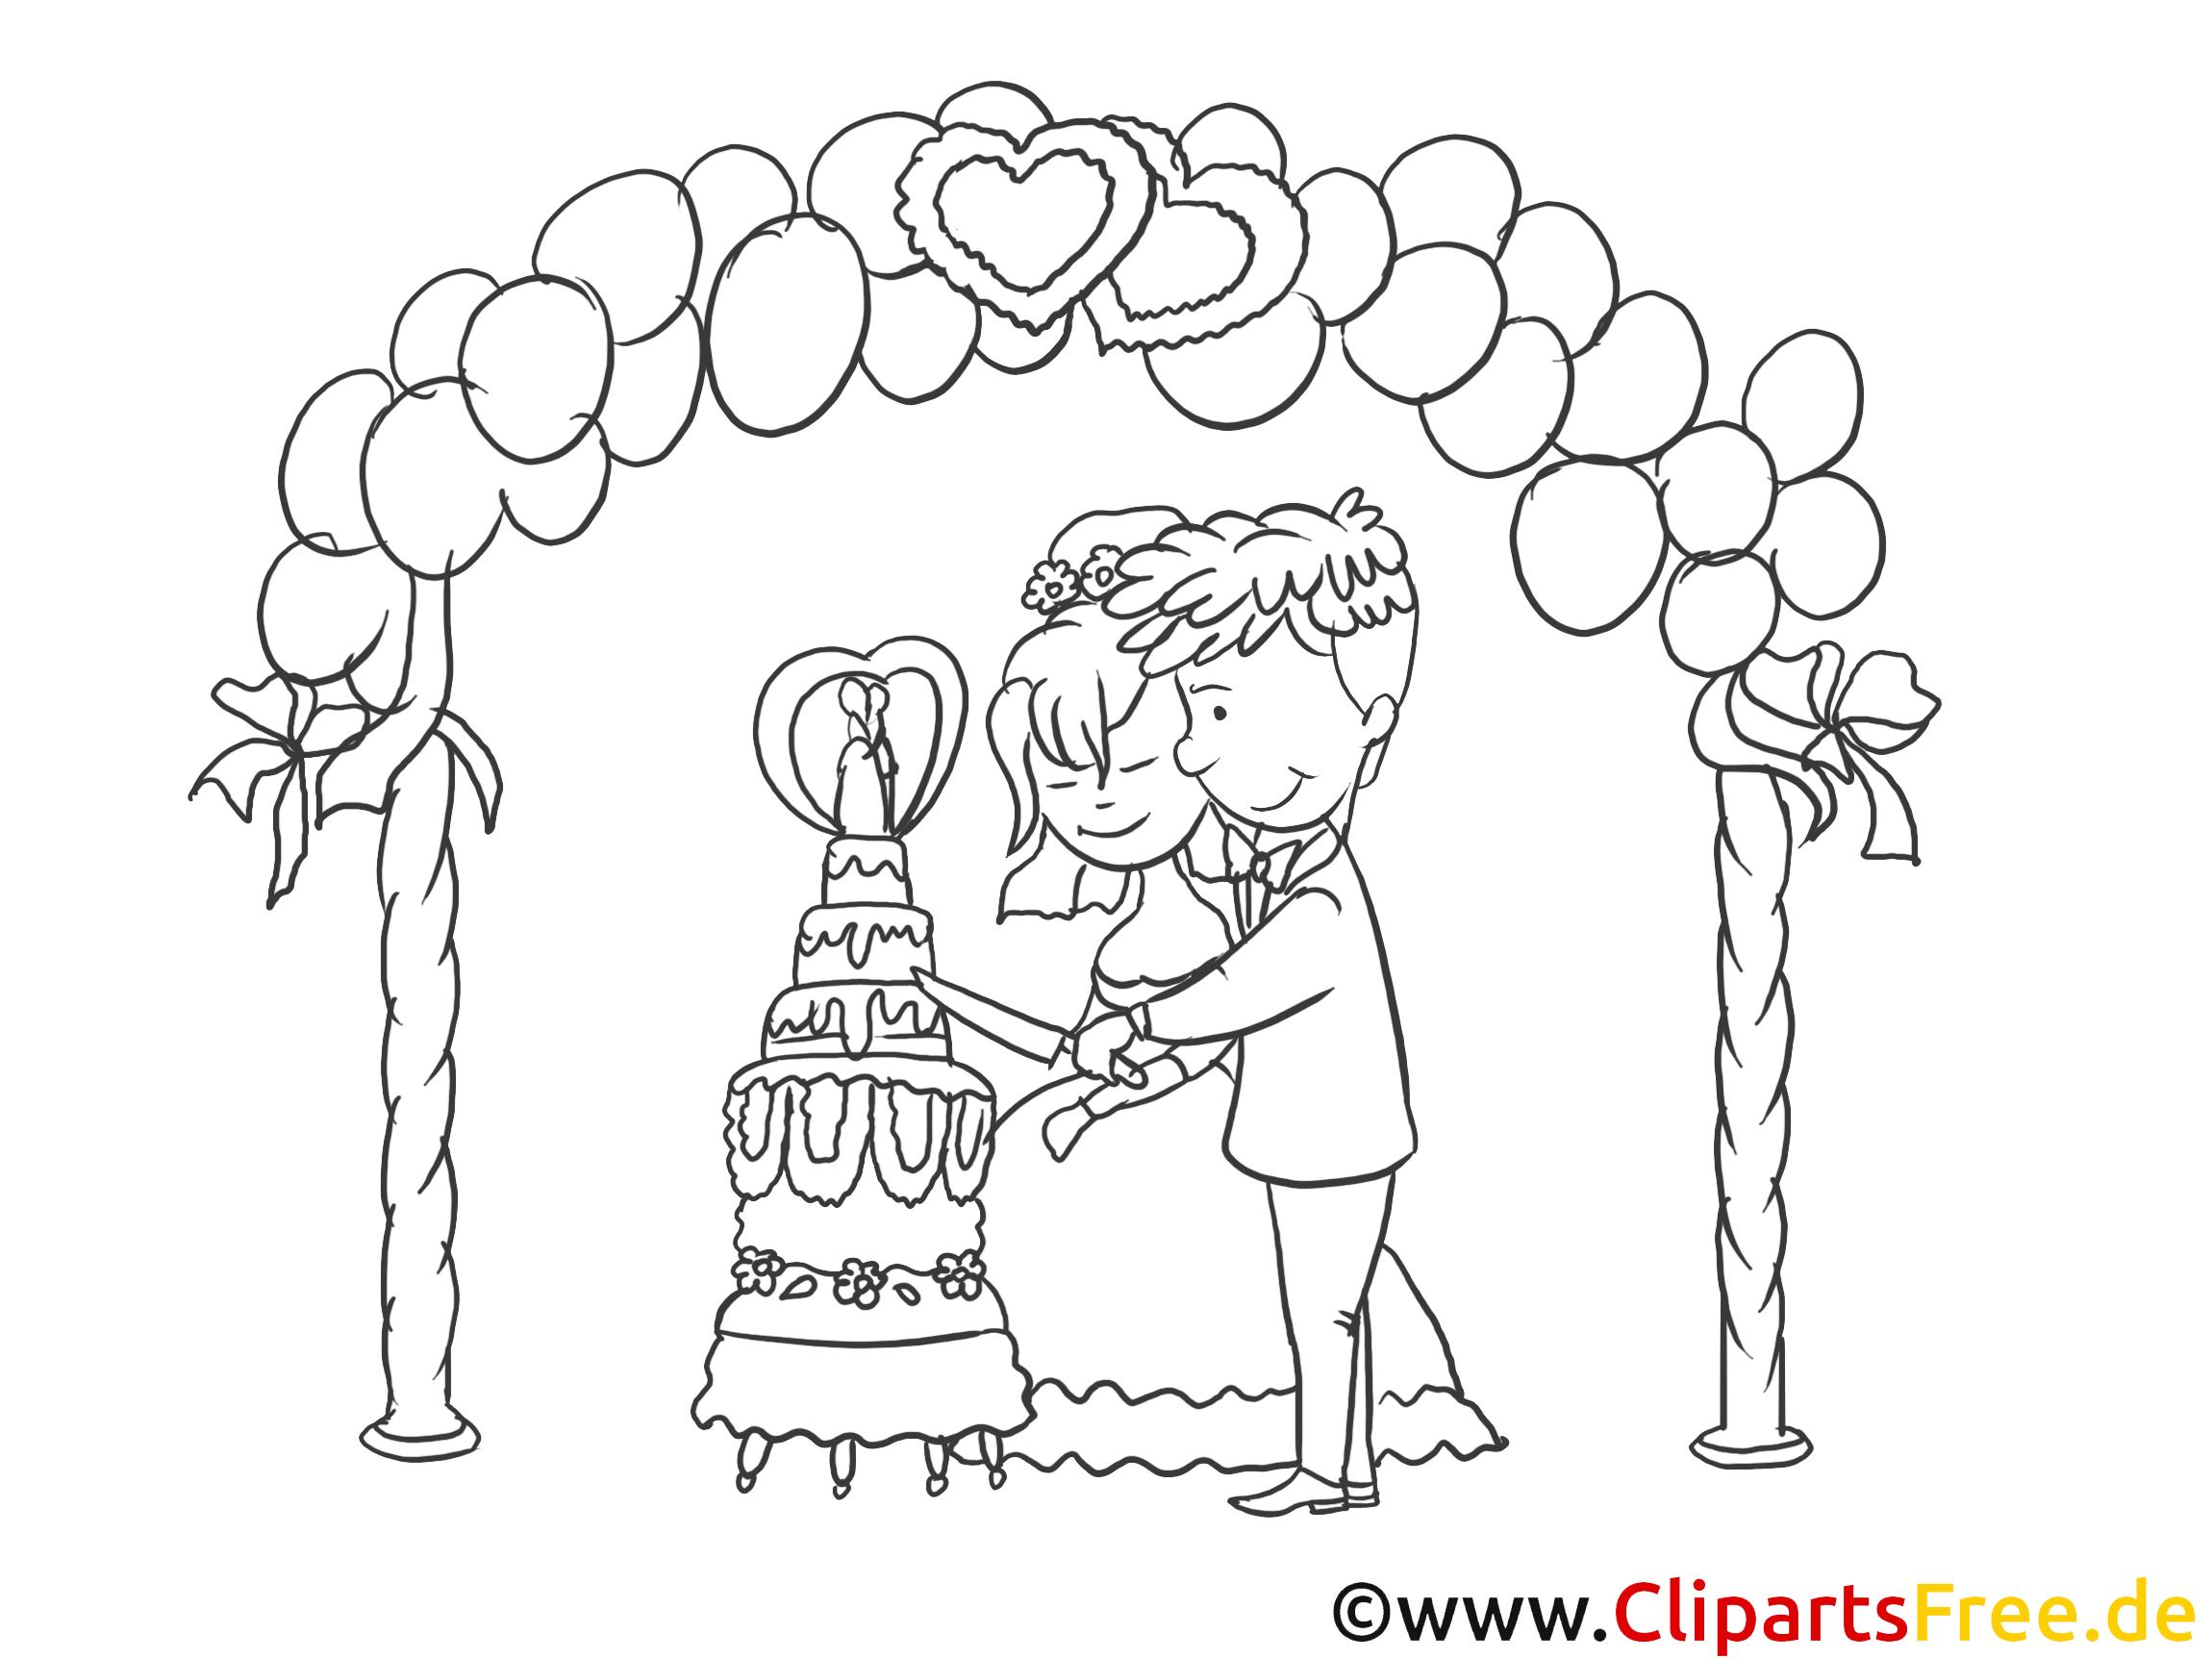 g teau dessin colorier mariage images mariage dessin picture image graphic clip art. Black Bedroom Furniture Sets. Home Design Ideas